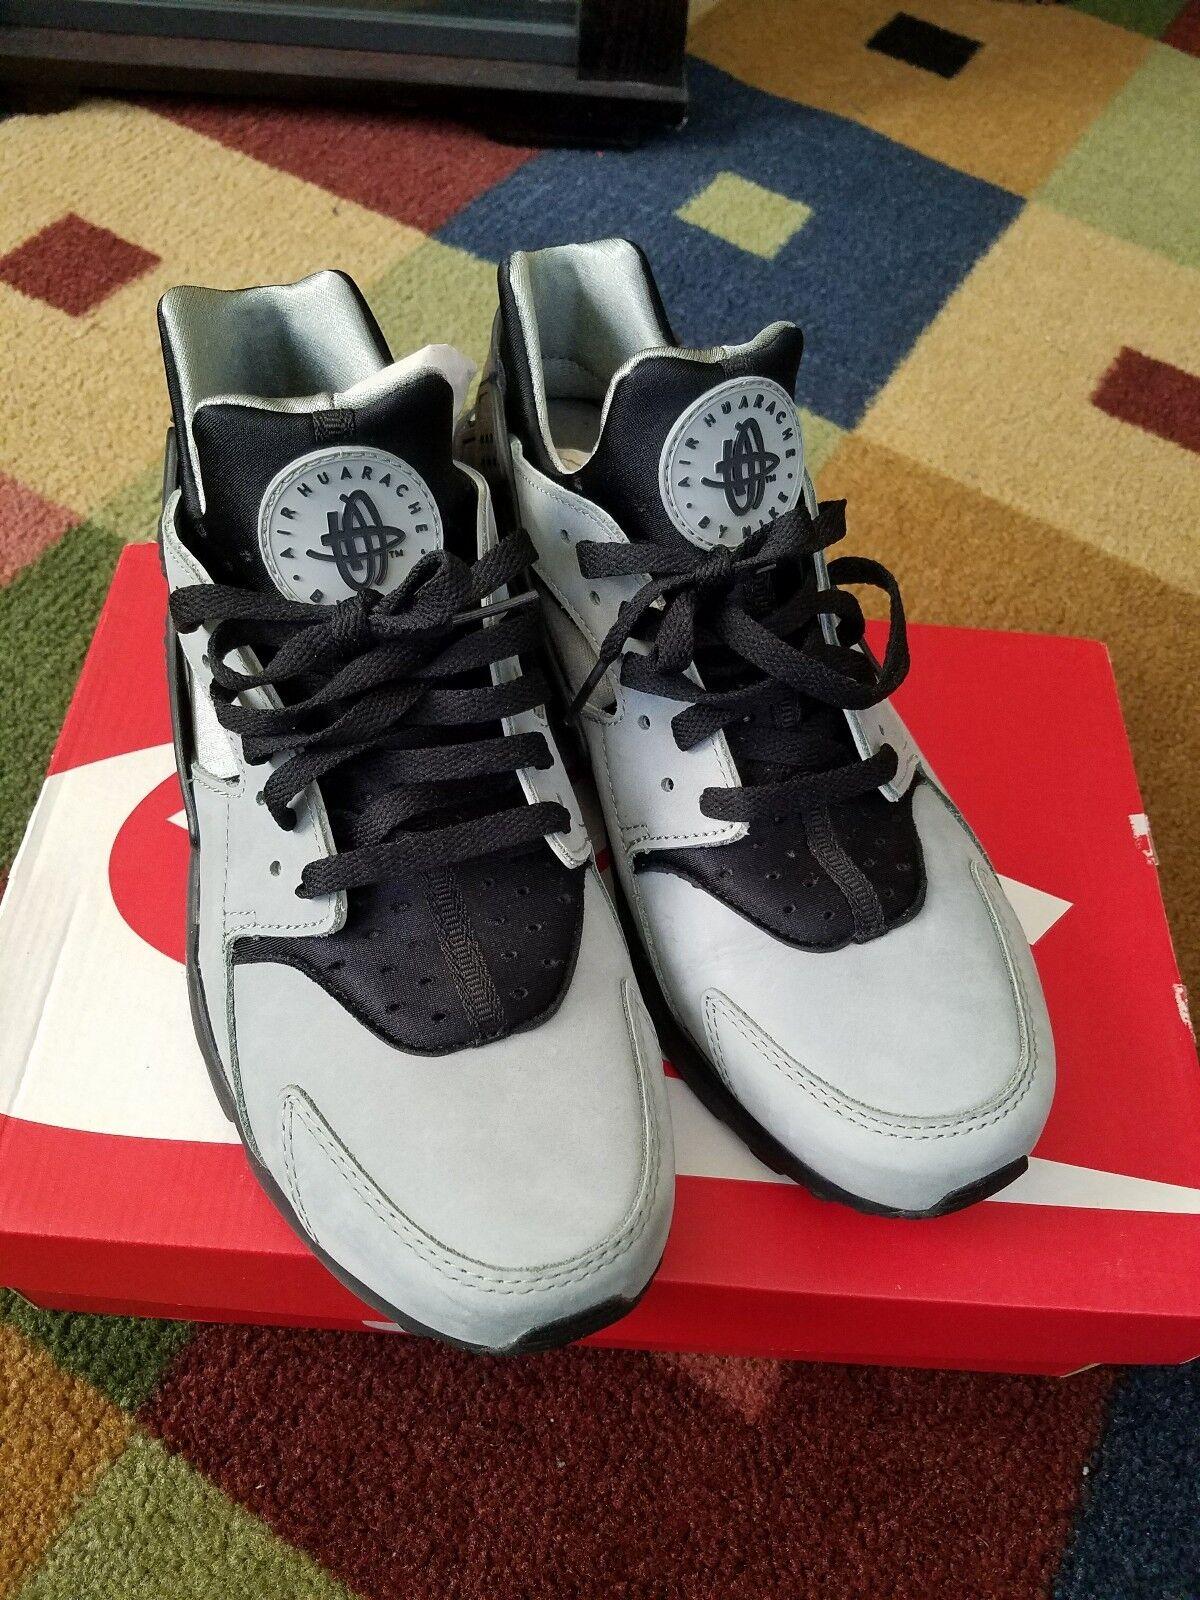 Mens Nike Huarache Run PRM 704830-301 Mica Green / Black preown Size 10.5